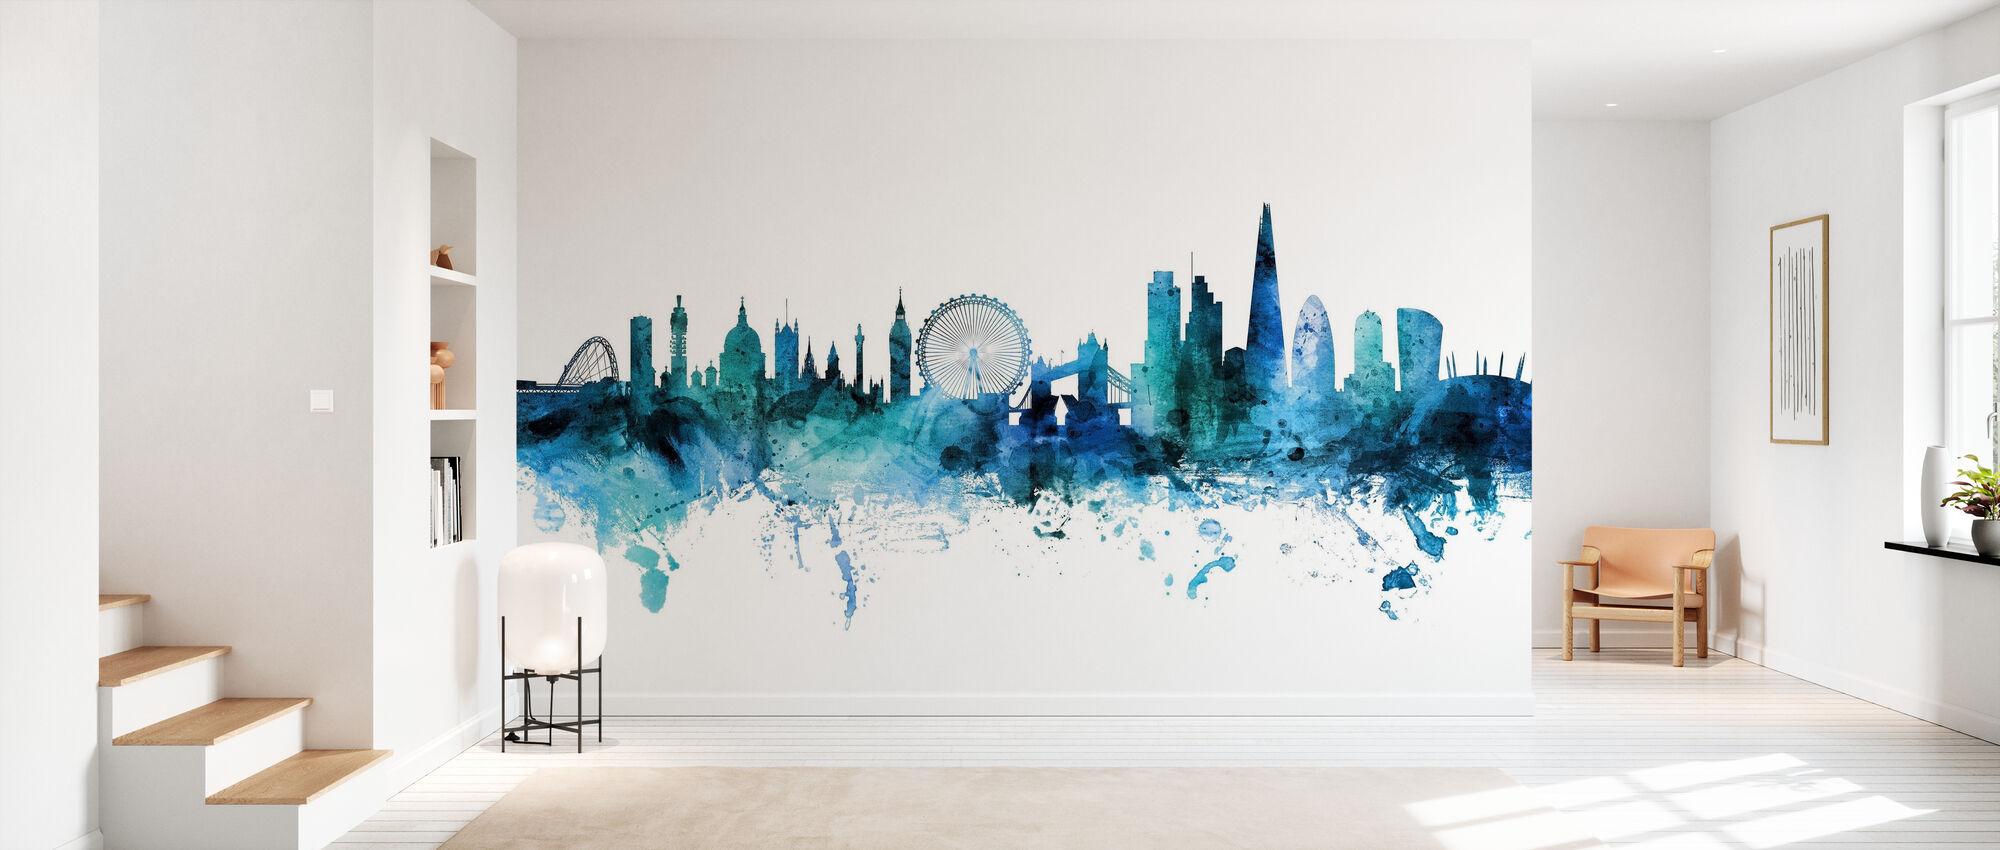 London England Skyline - Wallpaper - Hallway